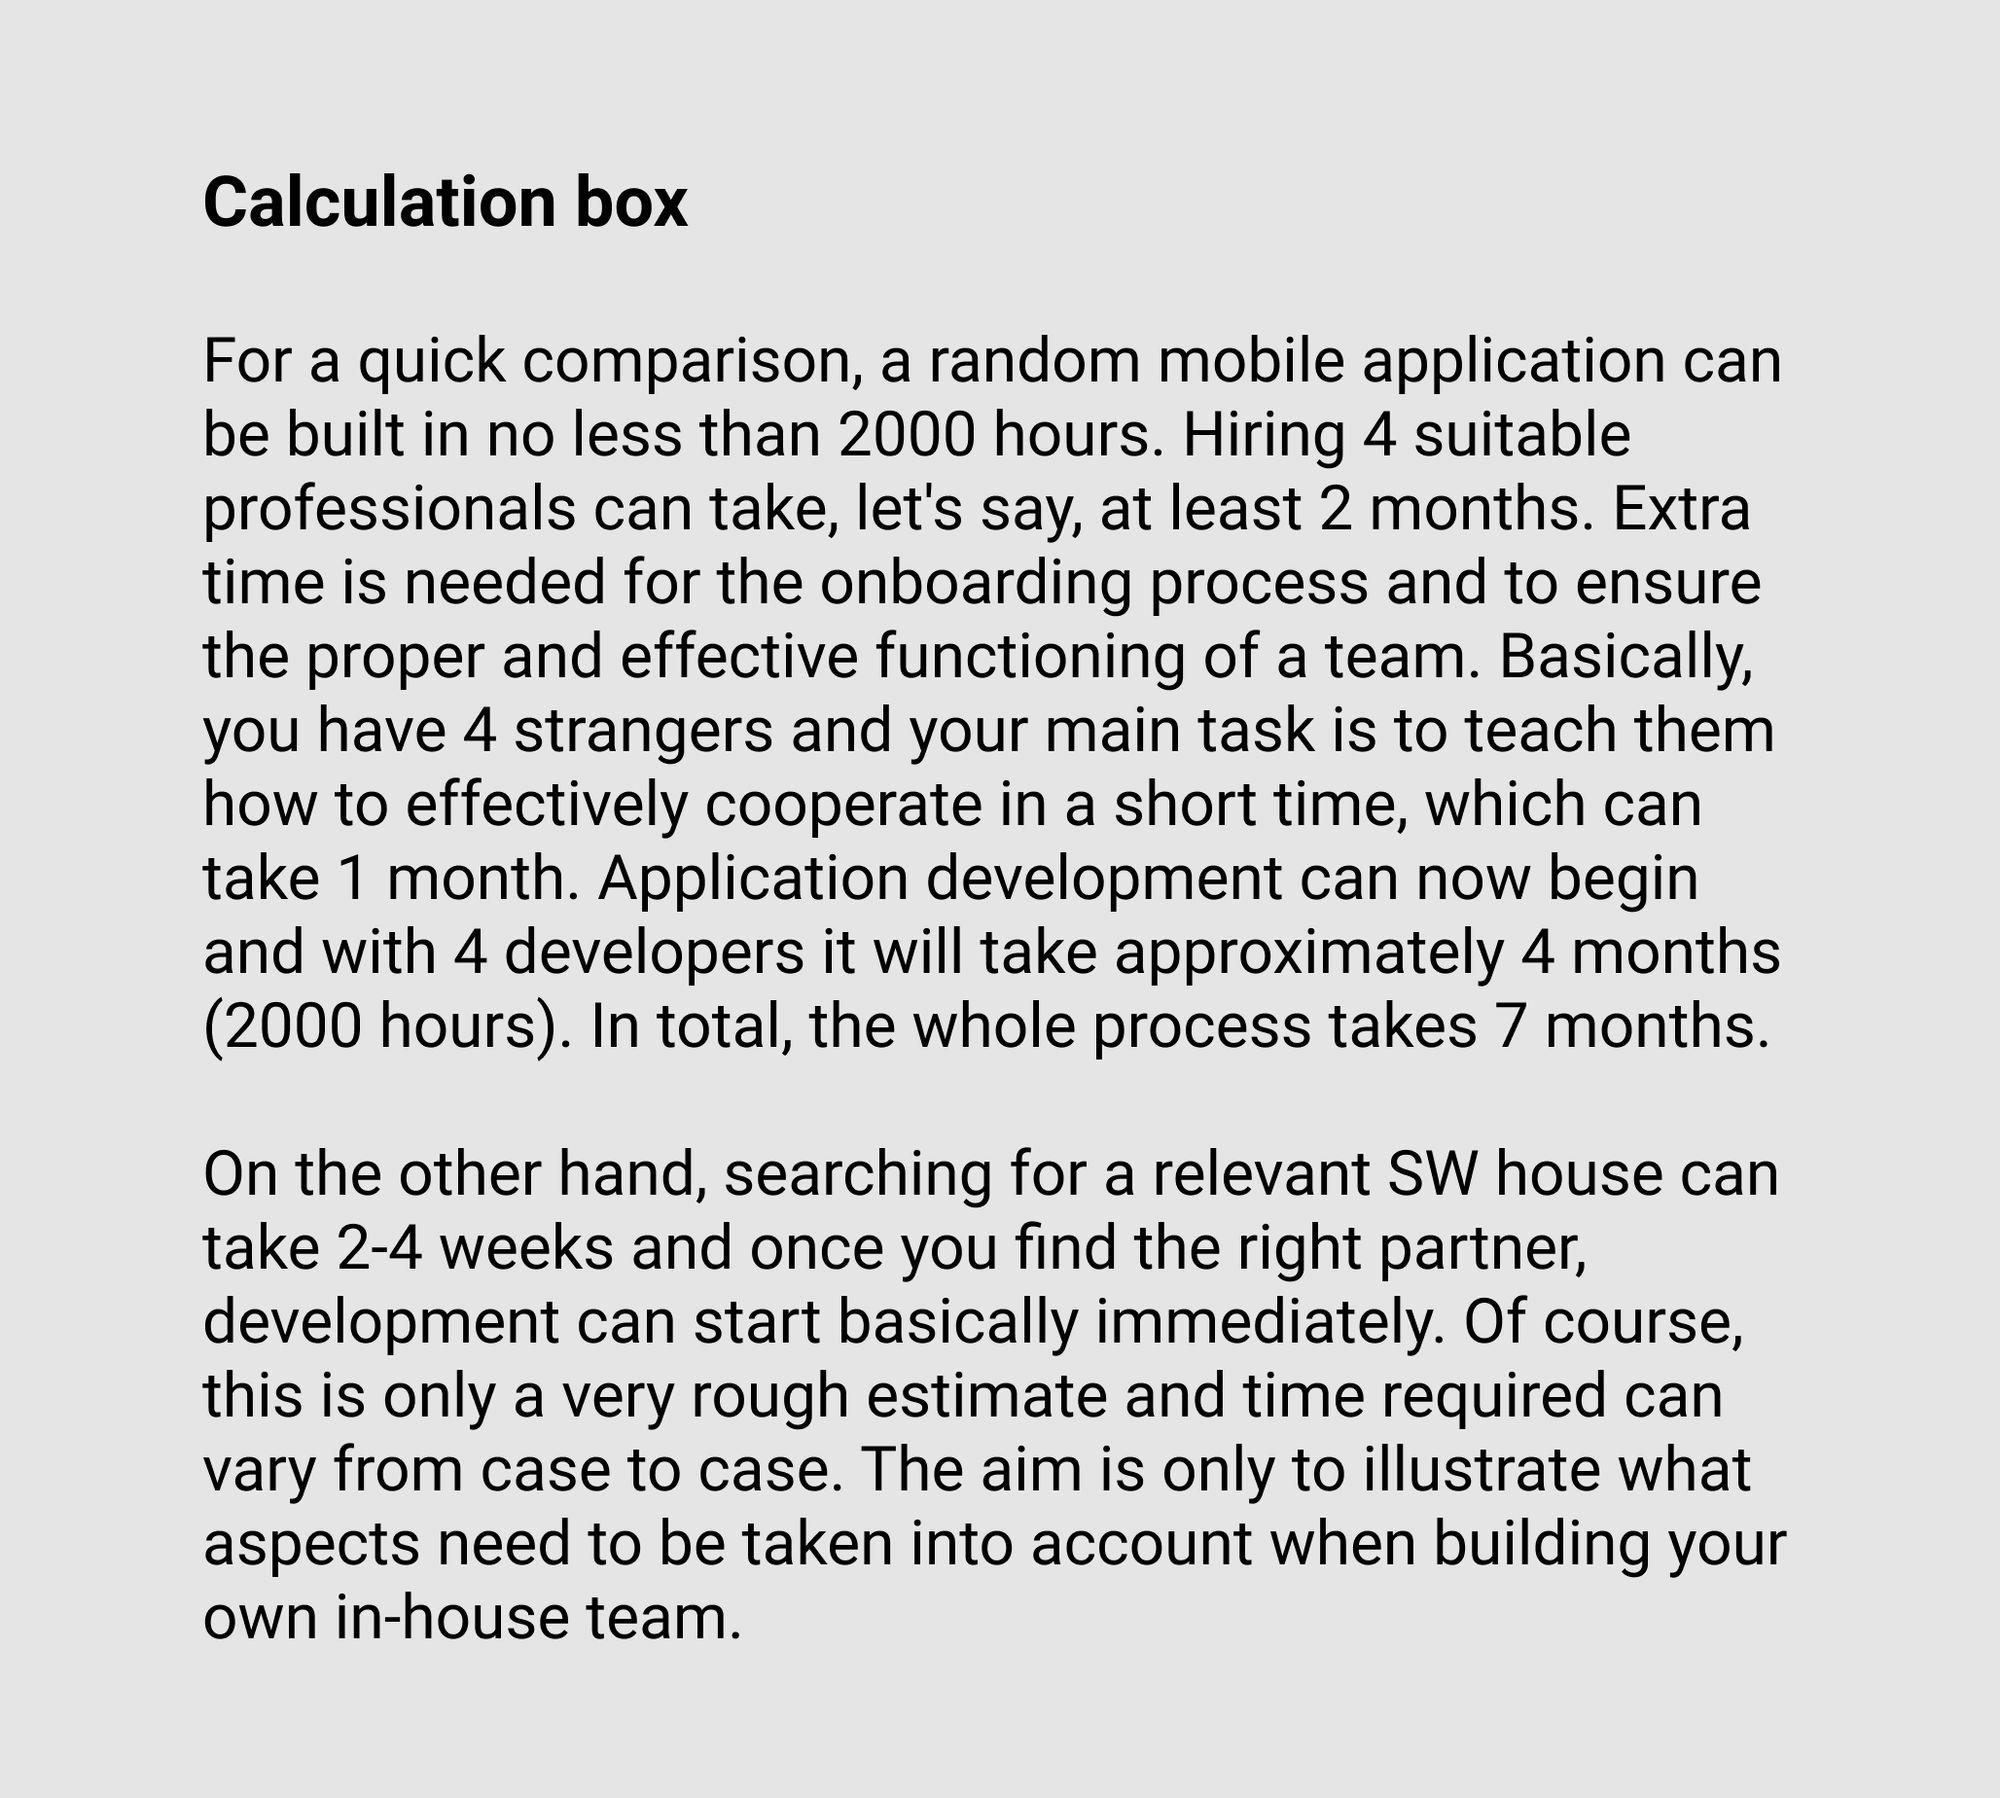 Calculation box